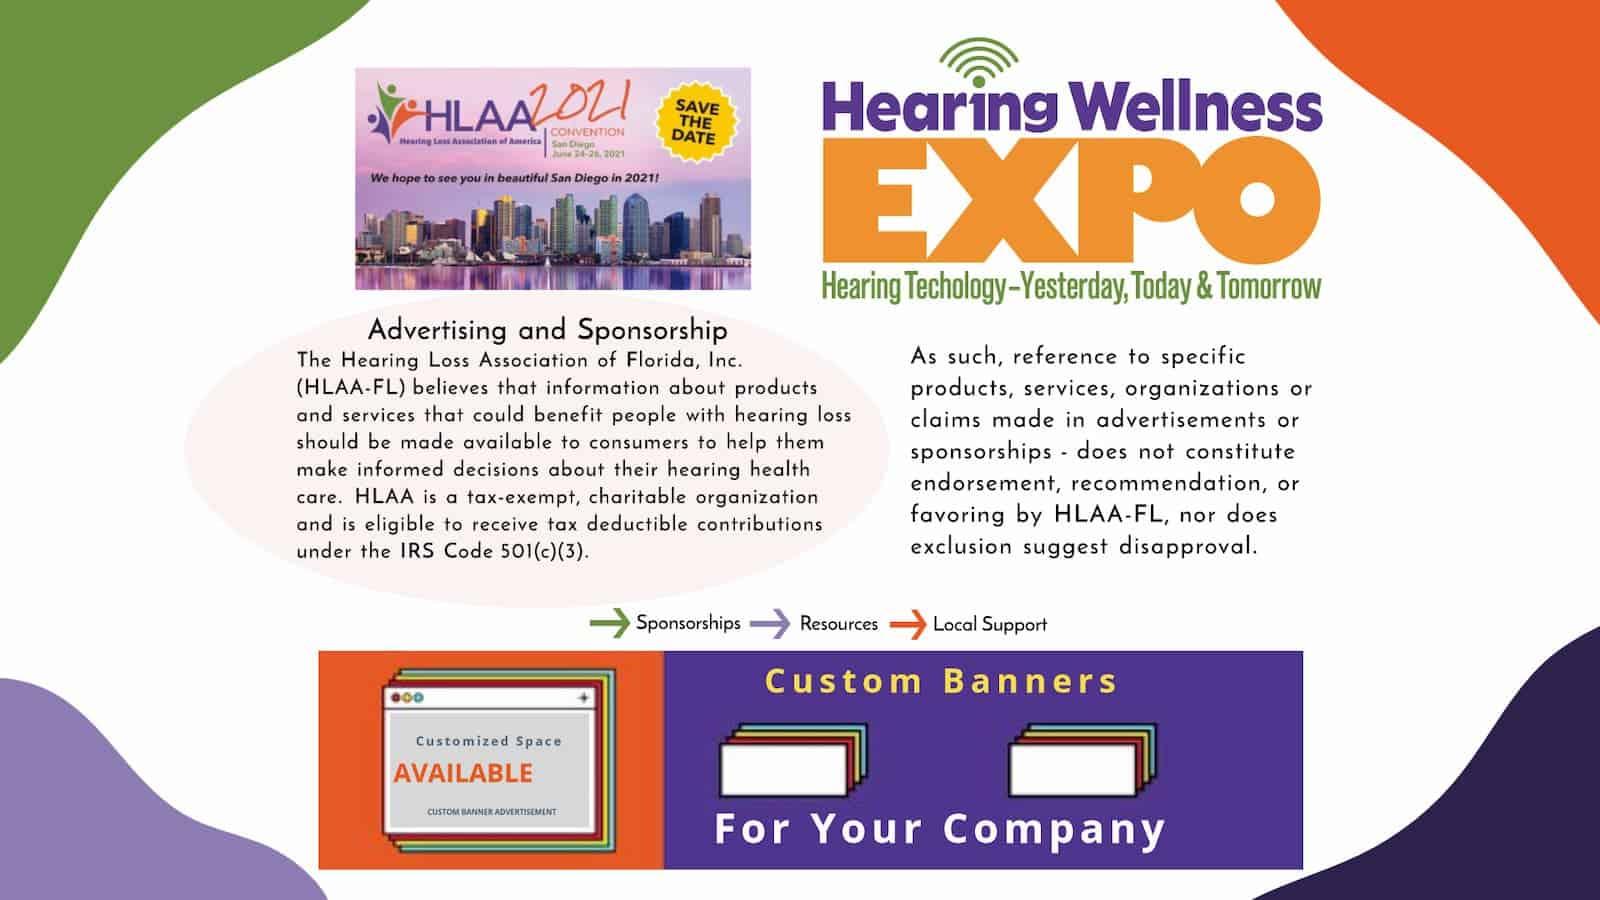 HLAA-FL AD/Sponsor Disclaimer